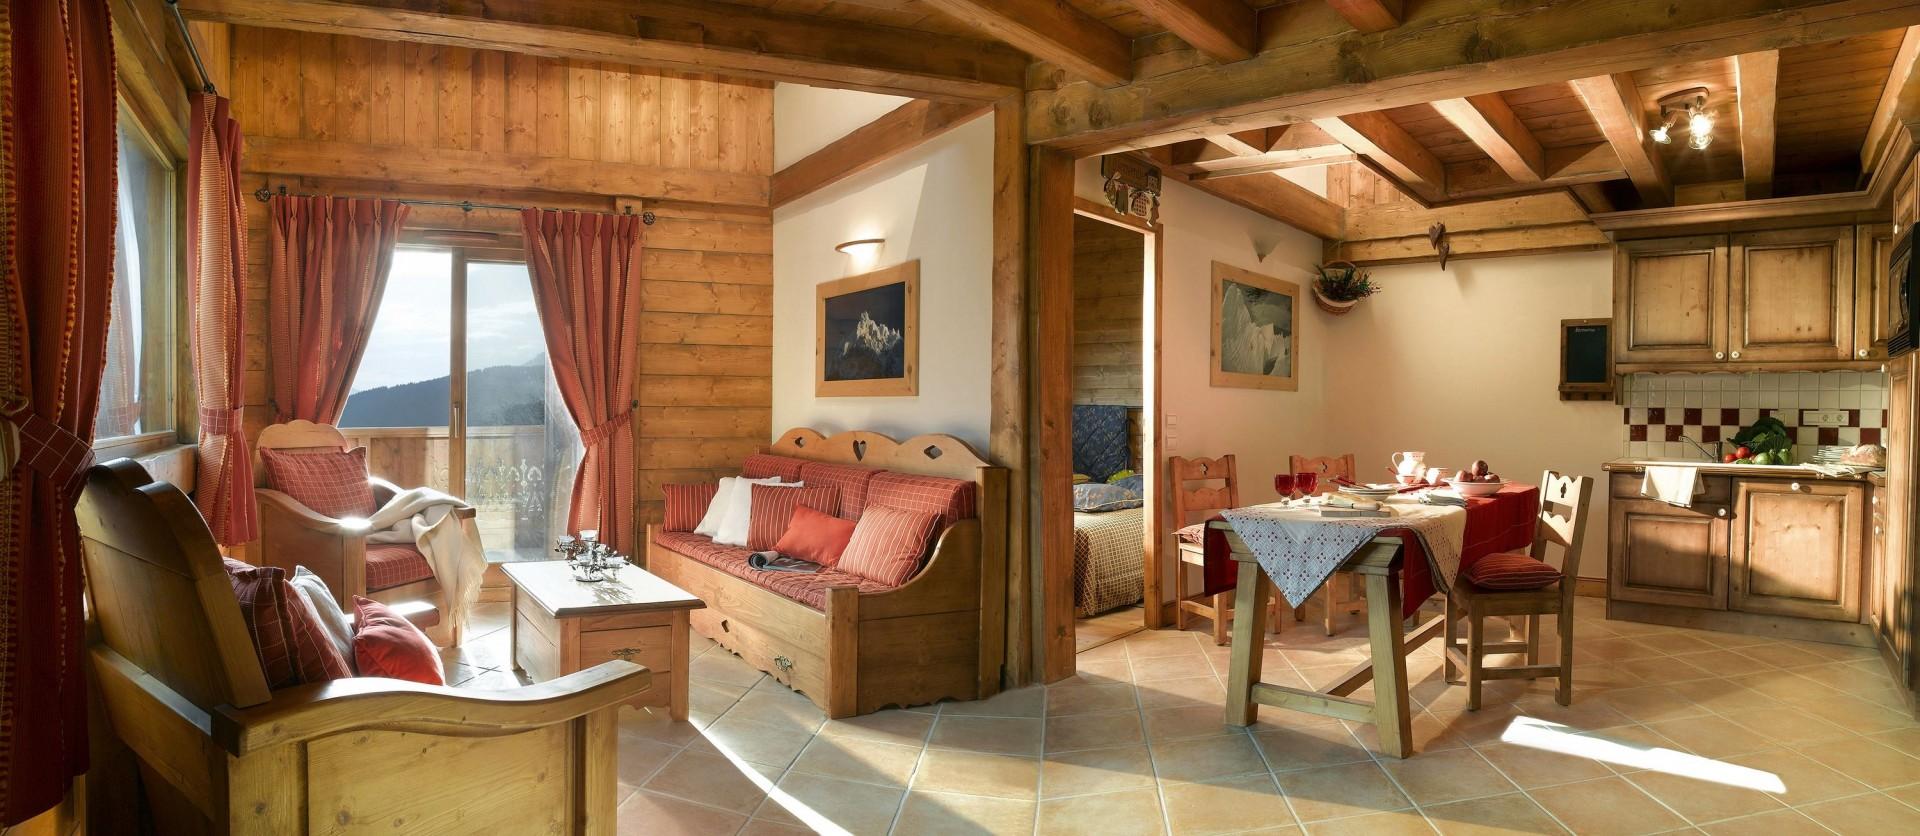 Peisey Vallandry  Location Appartement Luxe Marcassite Salon